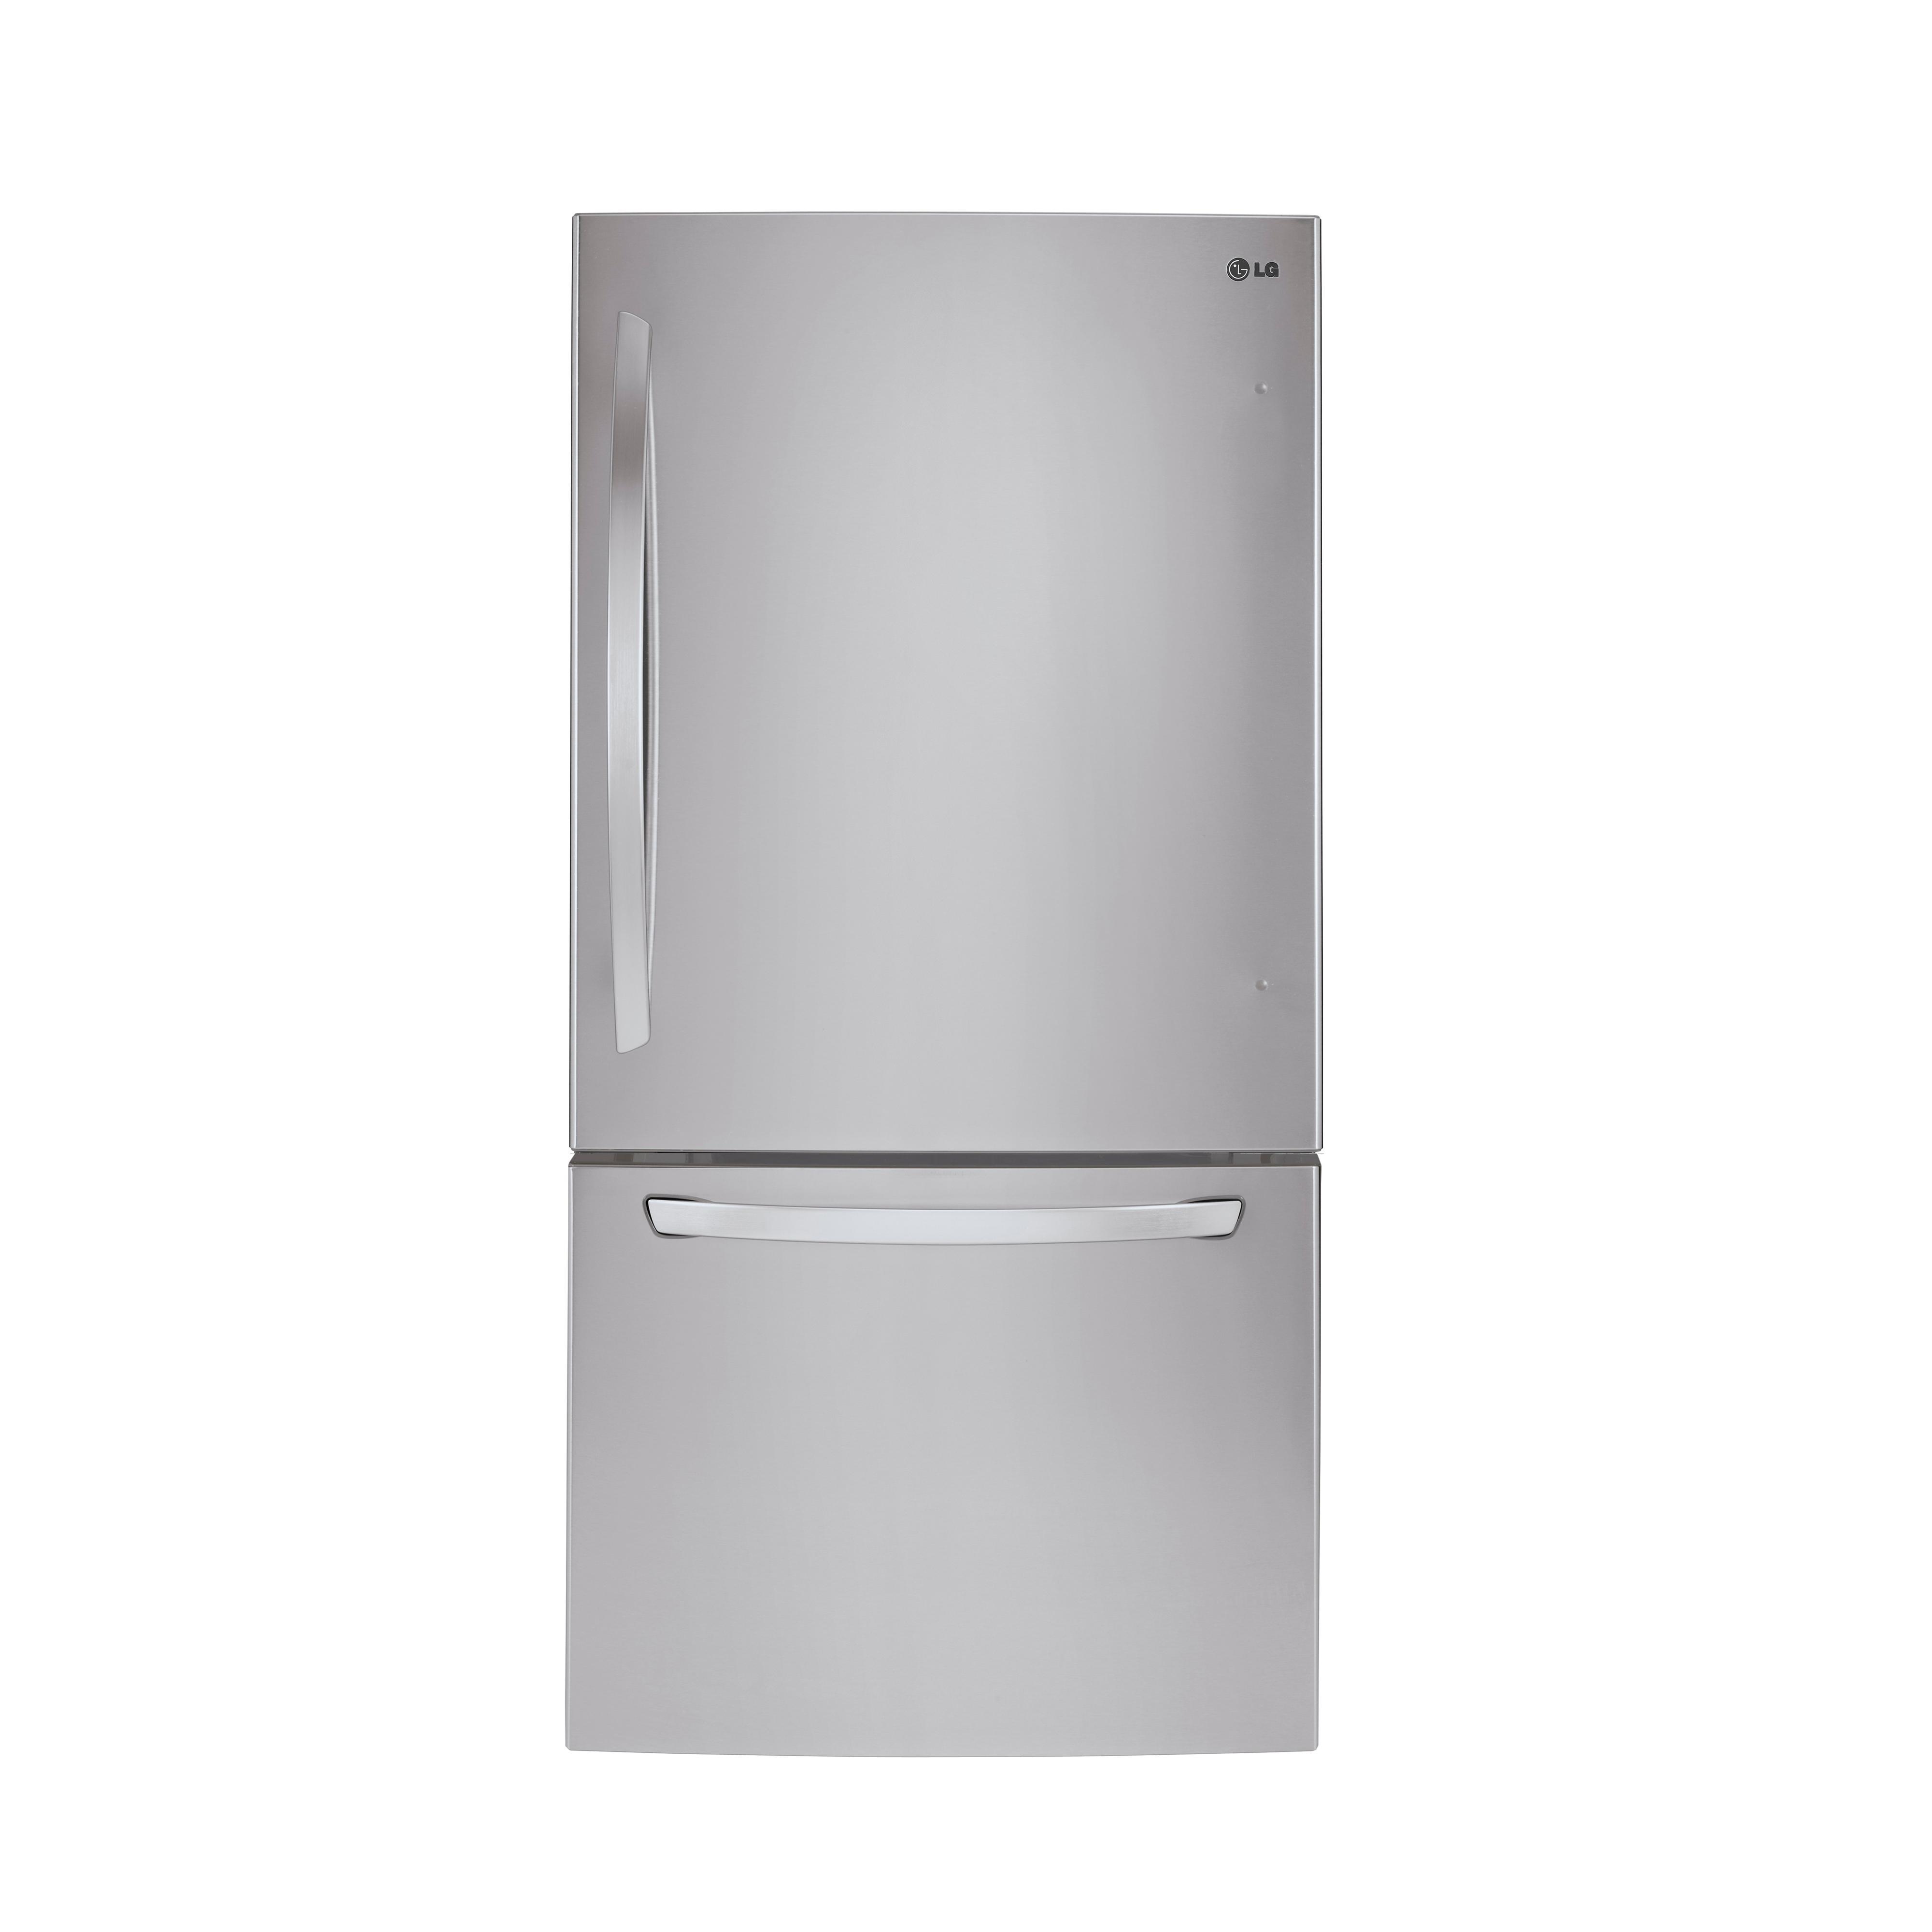 LG Appliances Bottom Freezer Refrigerators LARGE CAPACITY BOTTOM FREEZER REFRIGERATOR - Item Number: LDC24370ST